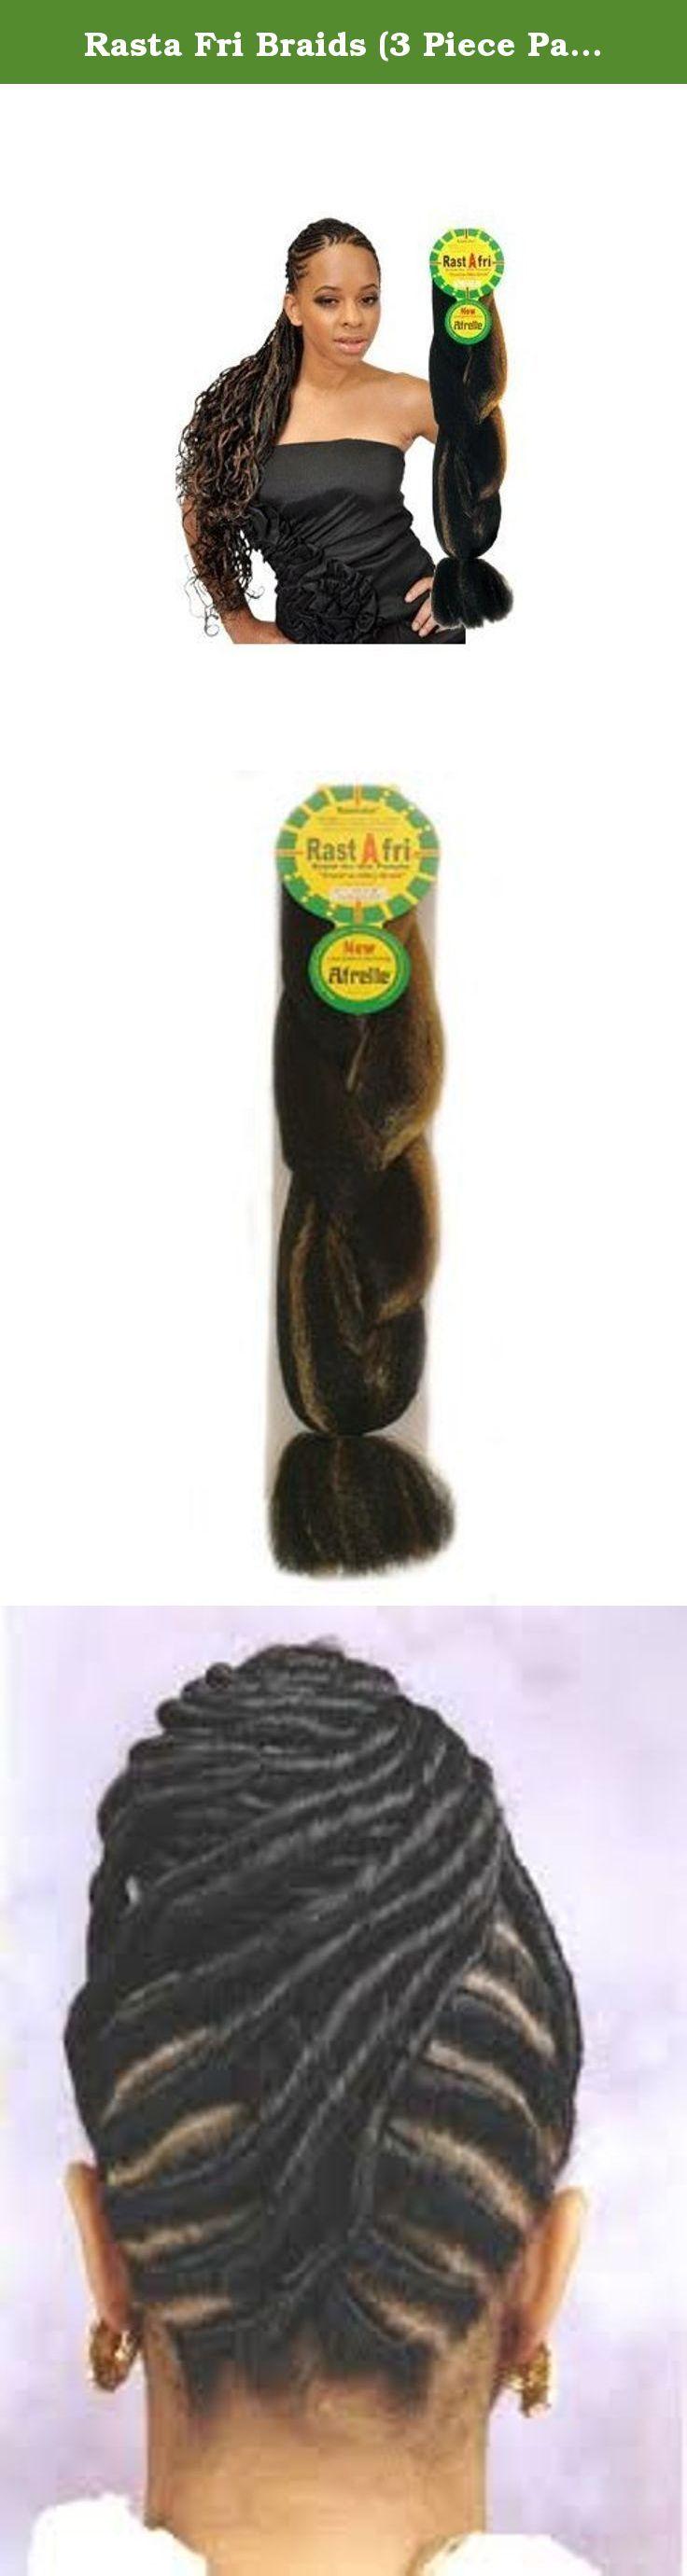 Rasta Fri Braids (3 Piece Pack for $10) (off black #1b). Rasta fri braid afrelle is a softer safer, silkier easier more elastic and natural braid fiber. The #1 seller for braids.